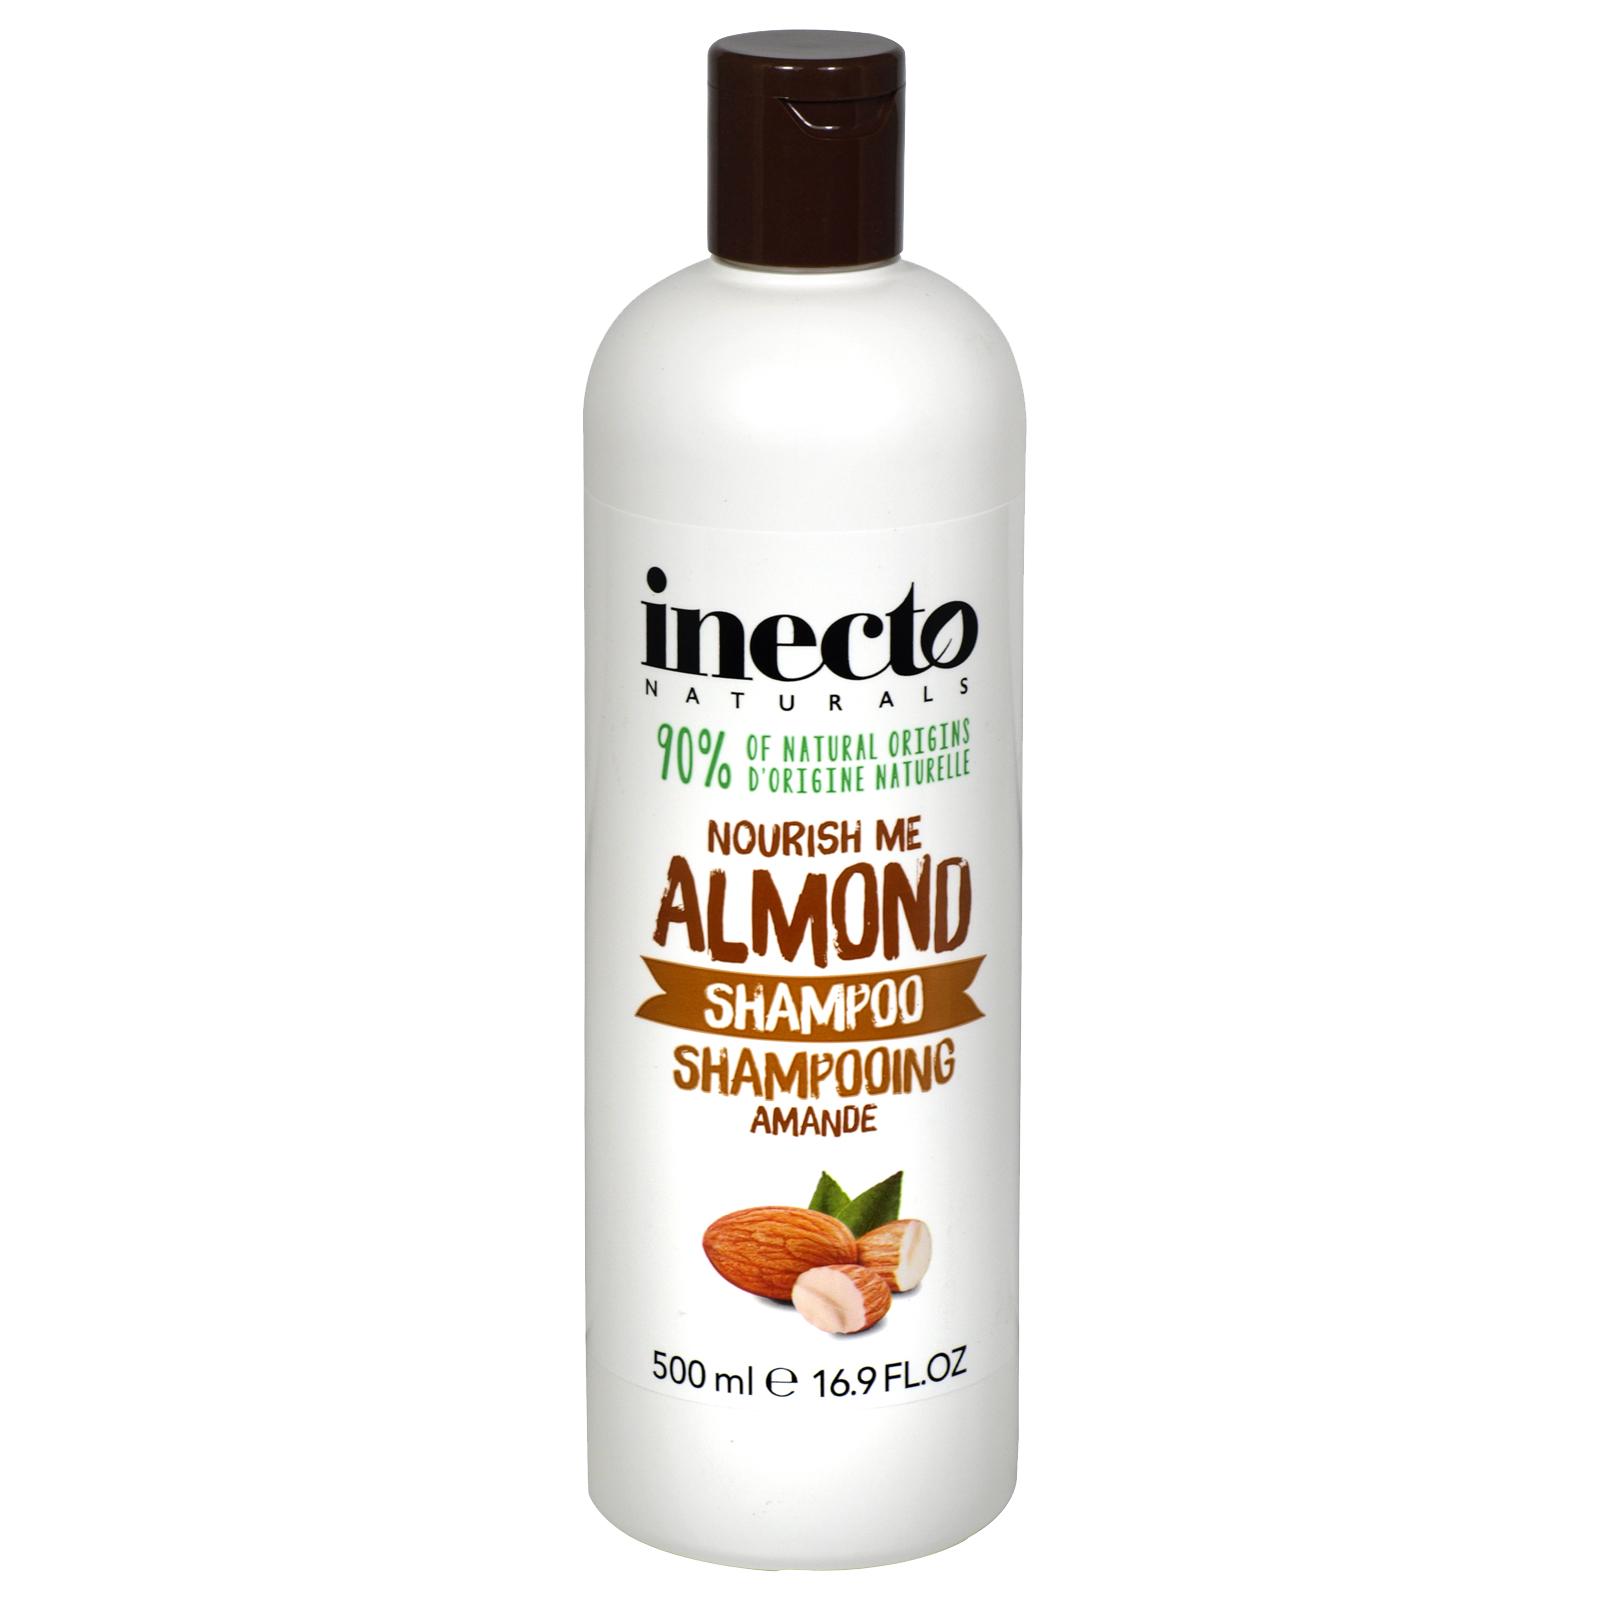 INECTO NOURISH ME ALMOND SHAMPOO 500ML X6